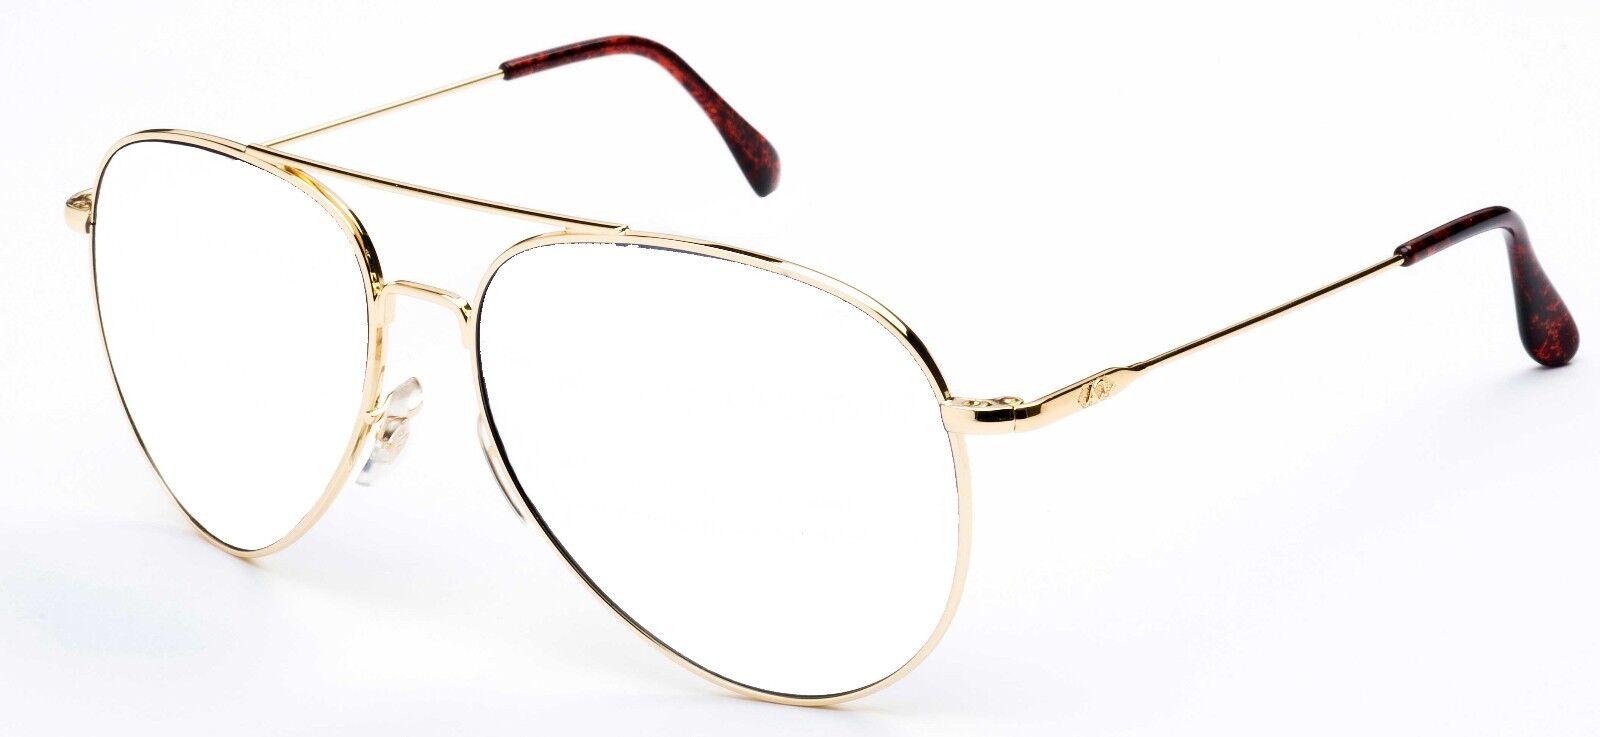 American Optical AO General Prescription Pilot Sunglasses Frames All  Versions 1877e08bc70